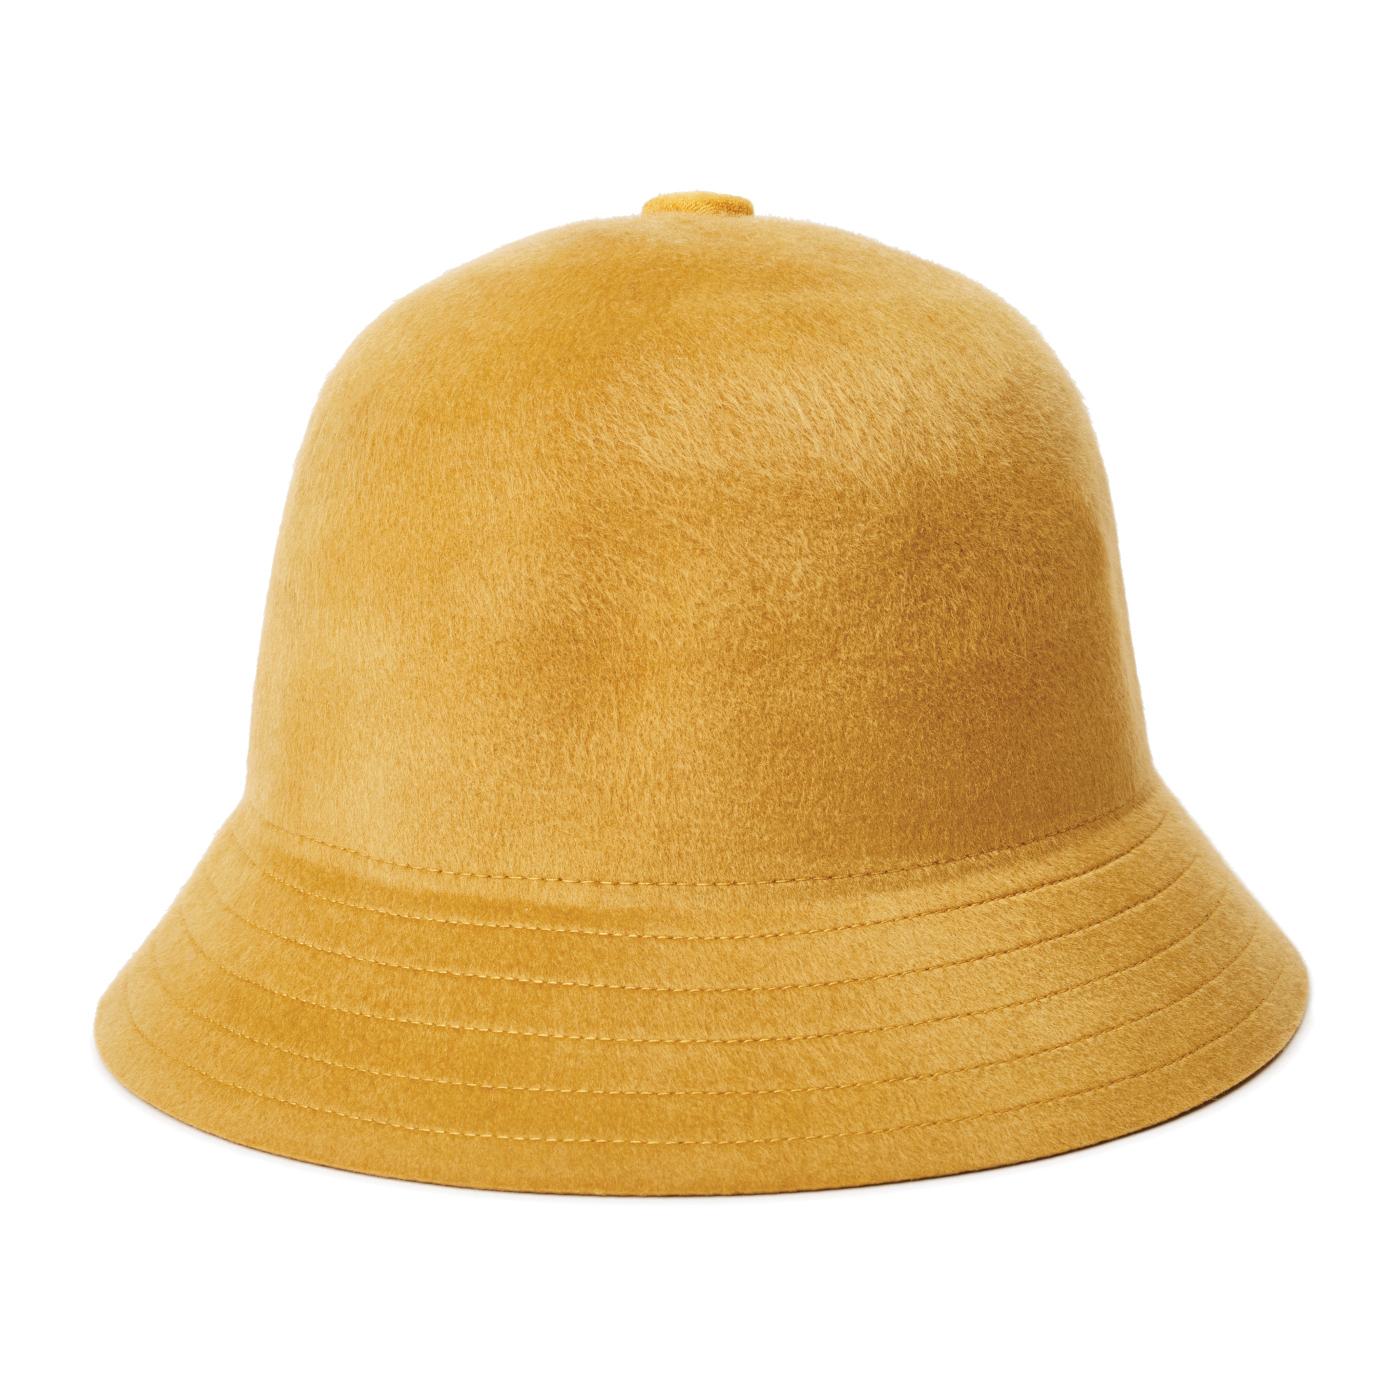 Brixton Essex chapeau 00972-MAIZE-M - Brixton - Modalova